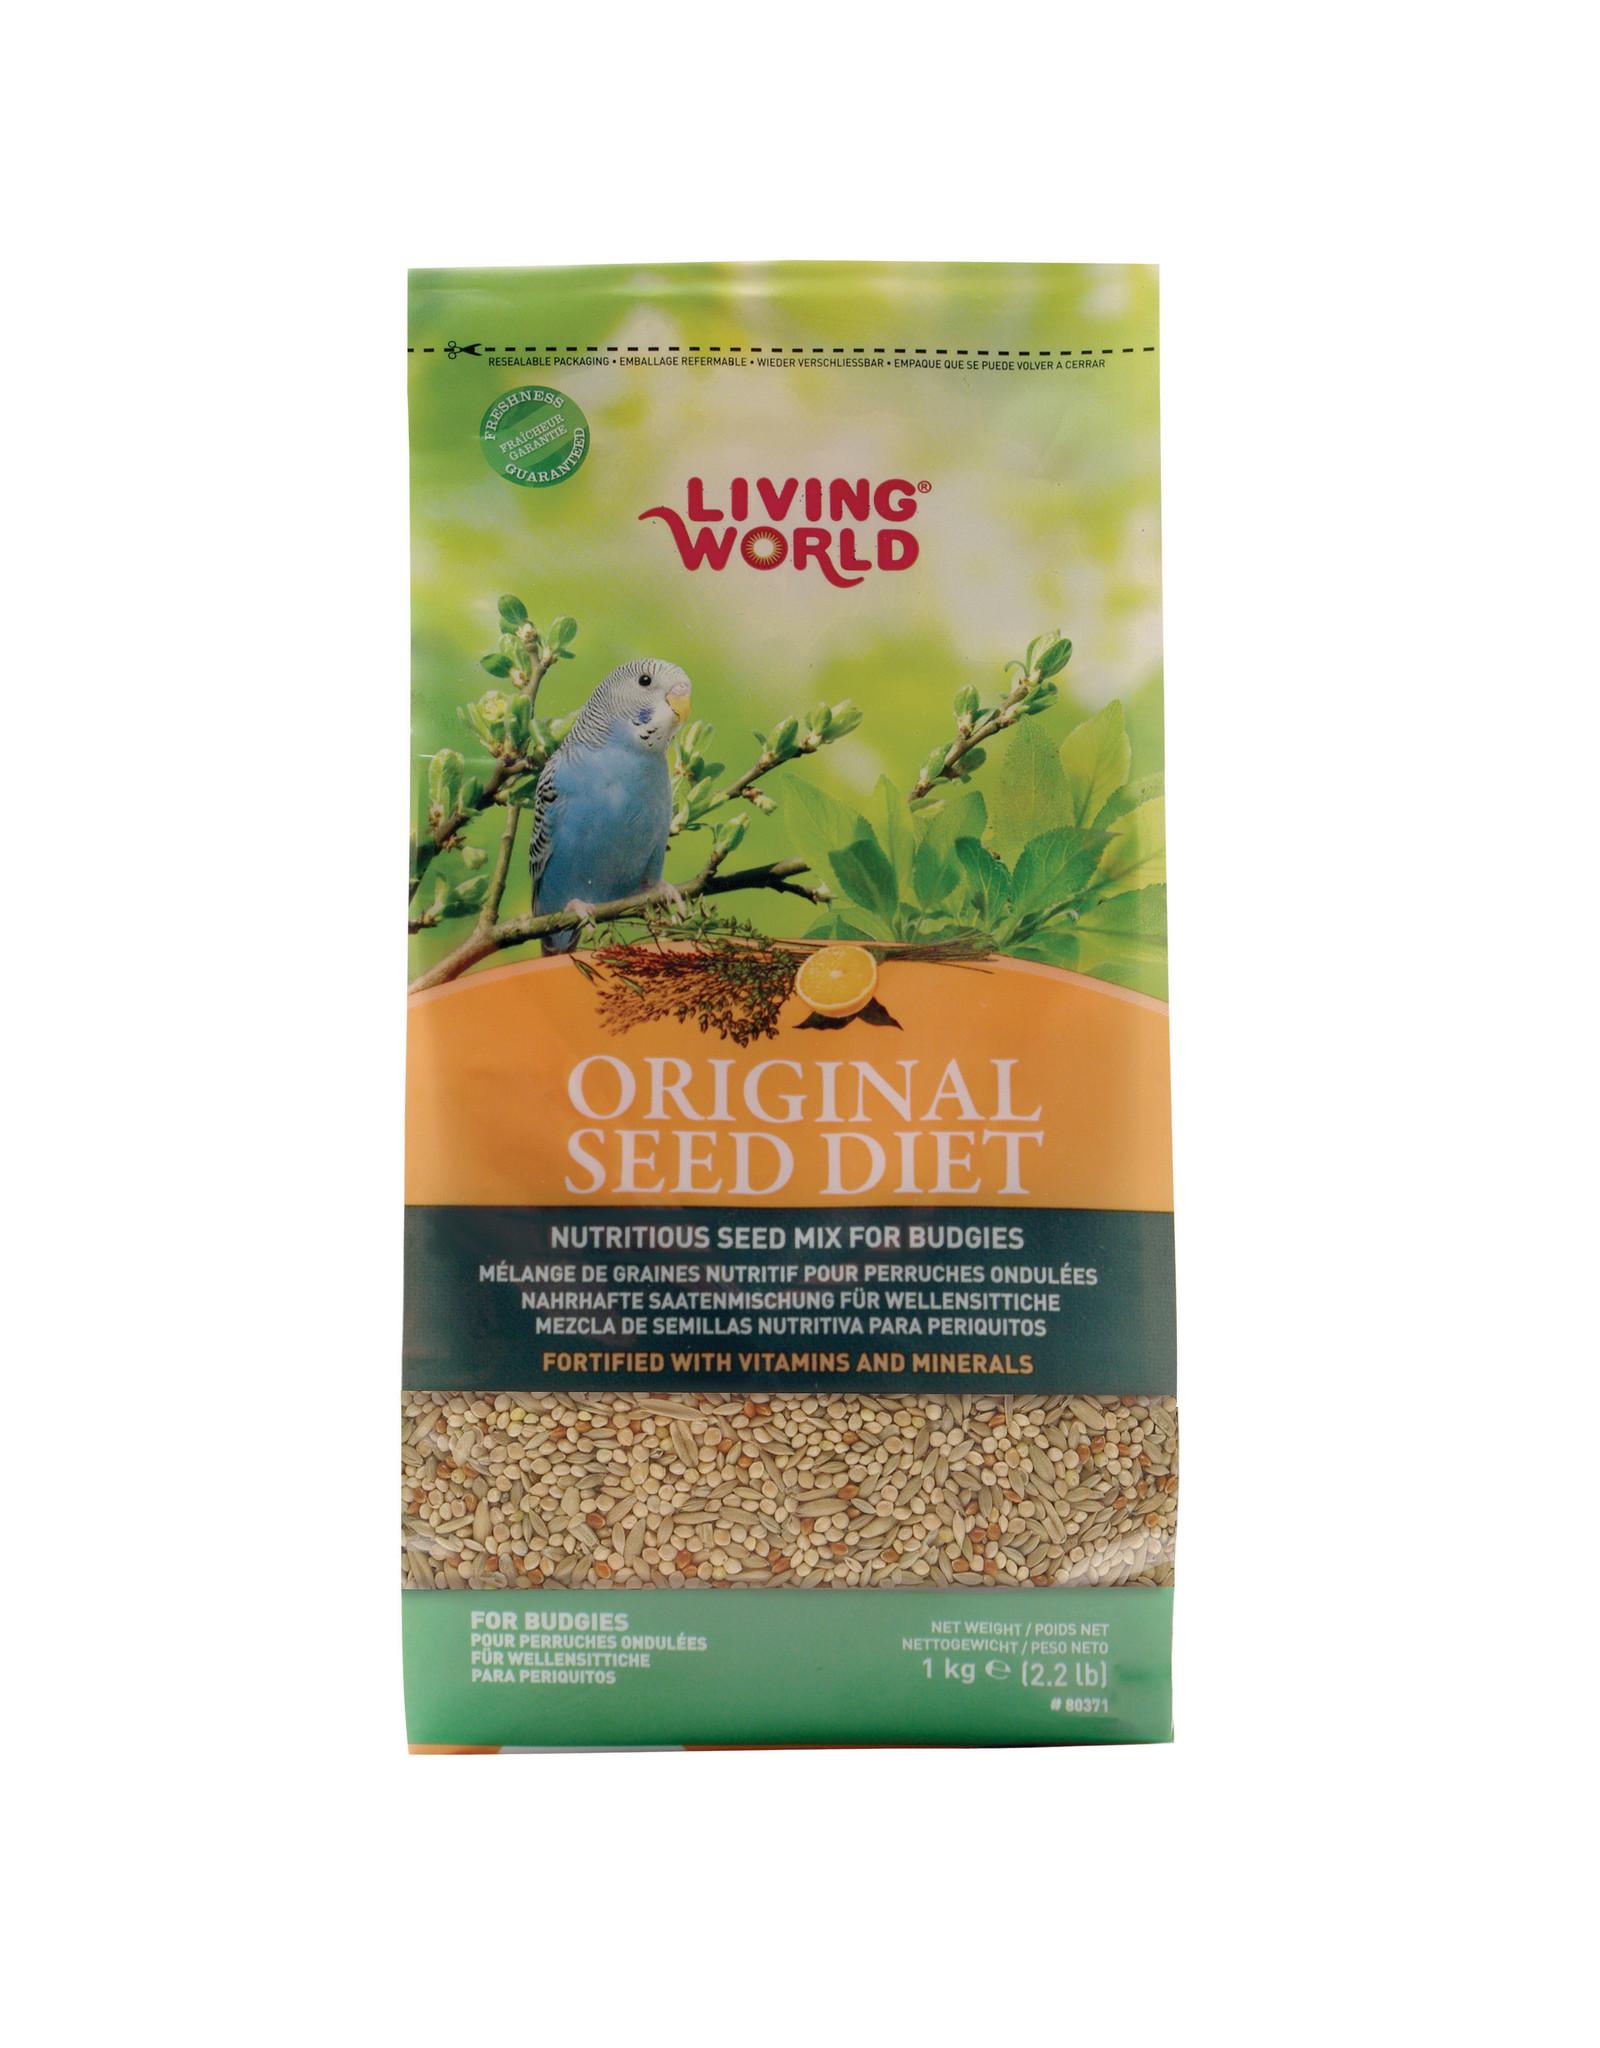 Living World Living World Original Seed Diet For Budgies - 1 kg (2.2 lb)